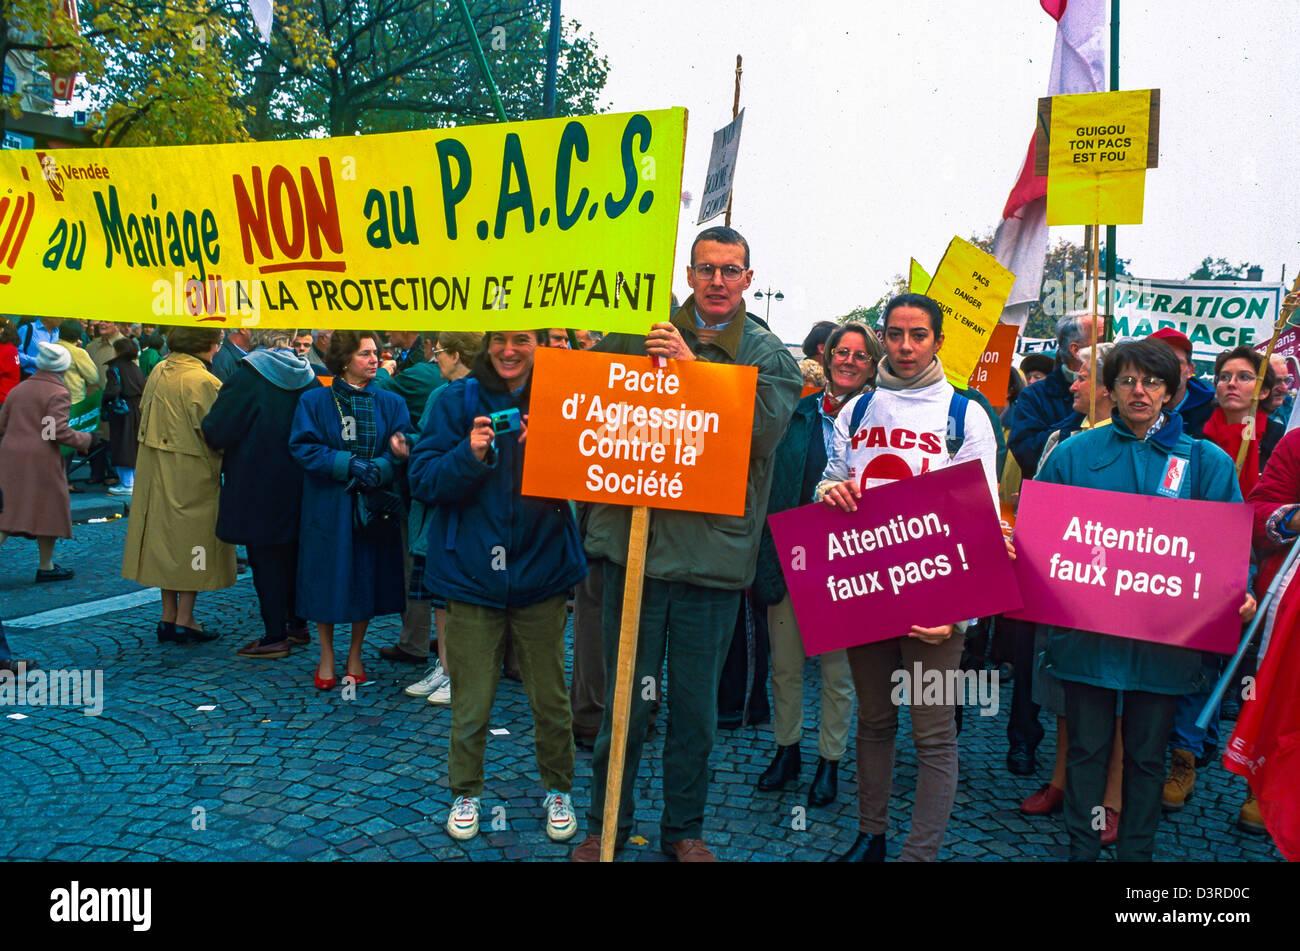 Pacs Gay Paris